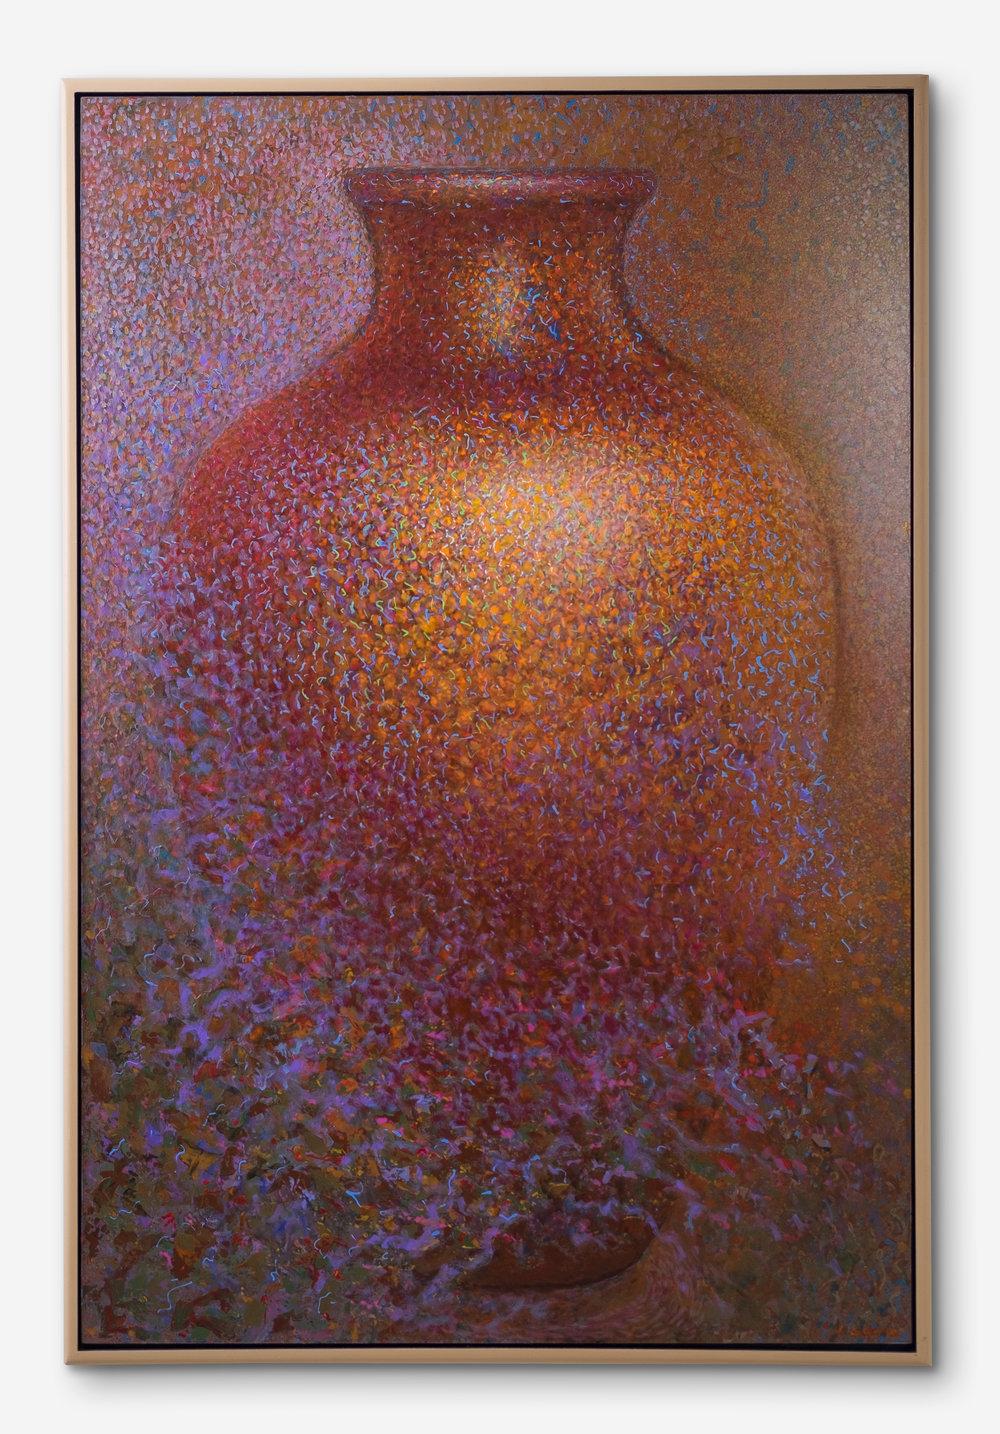 Earth Vase #6